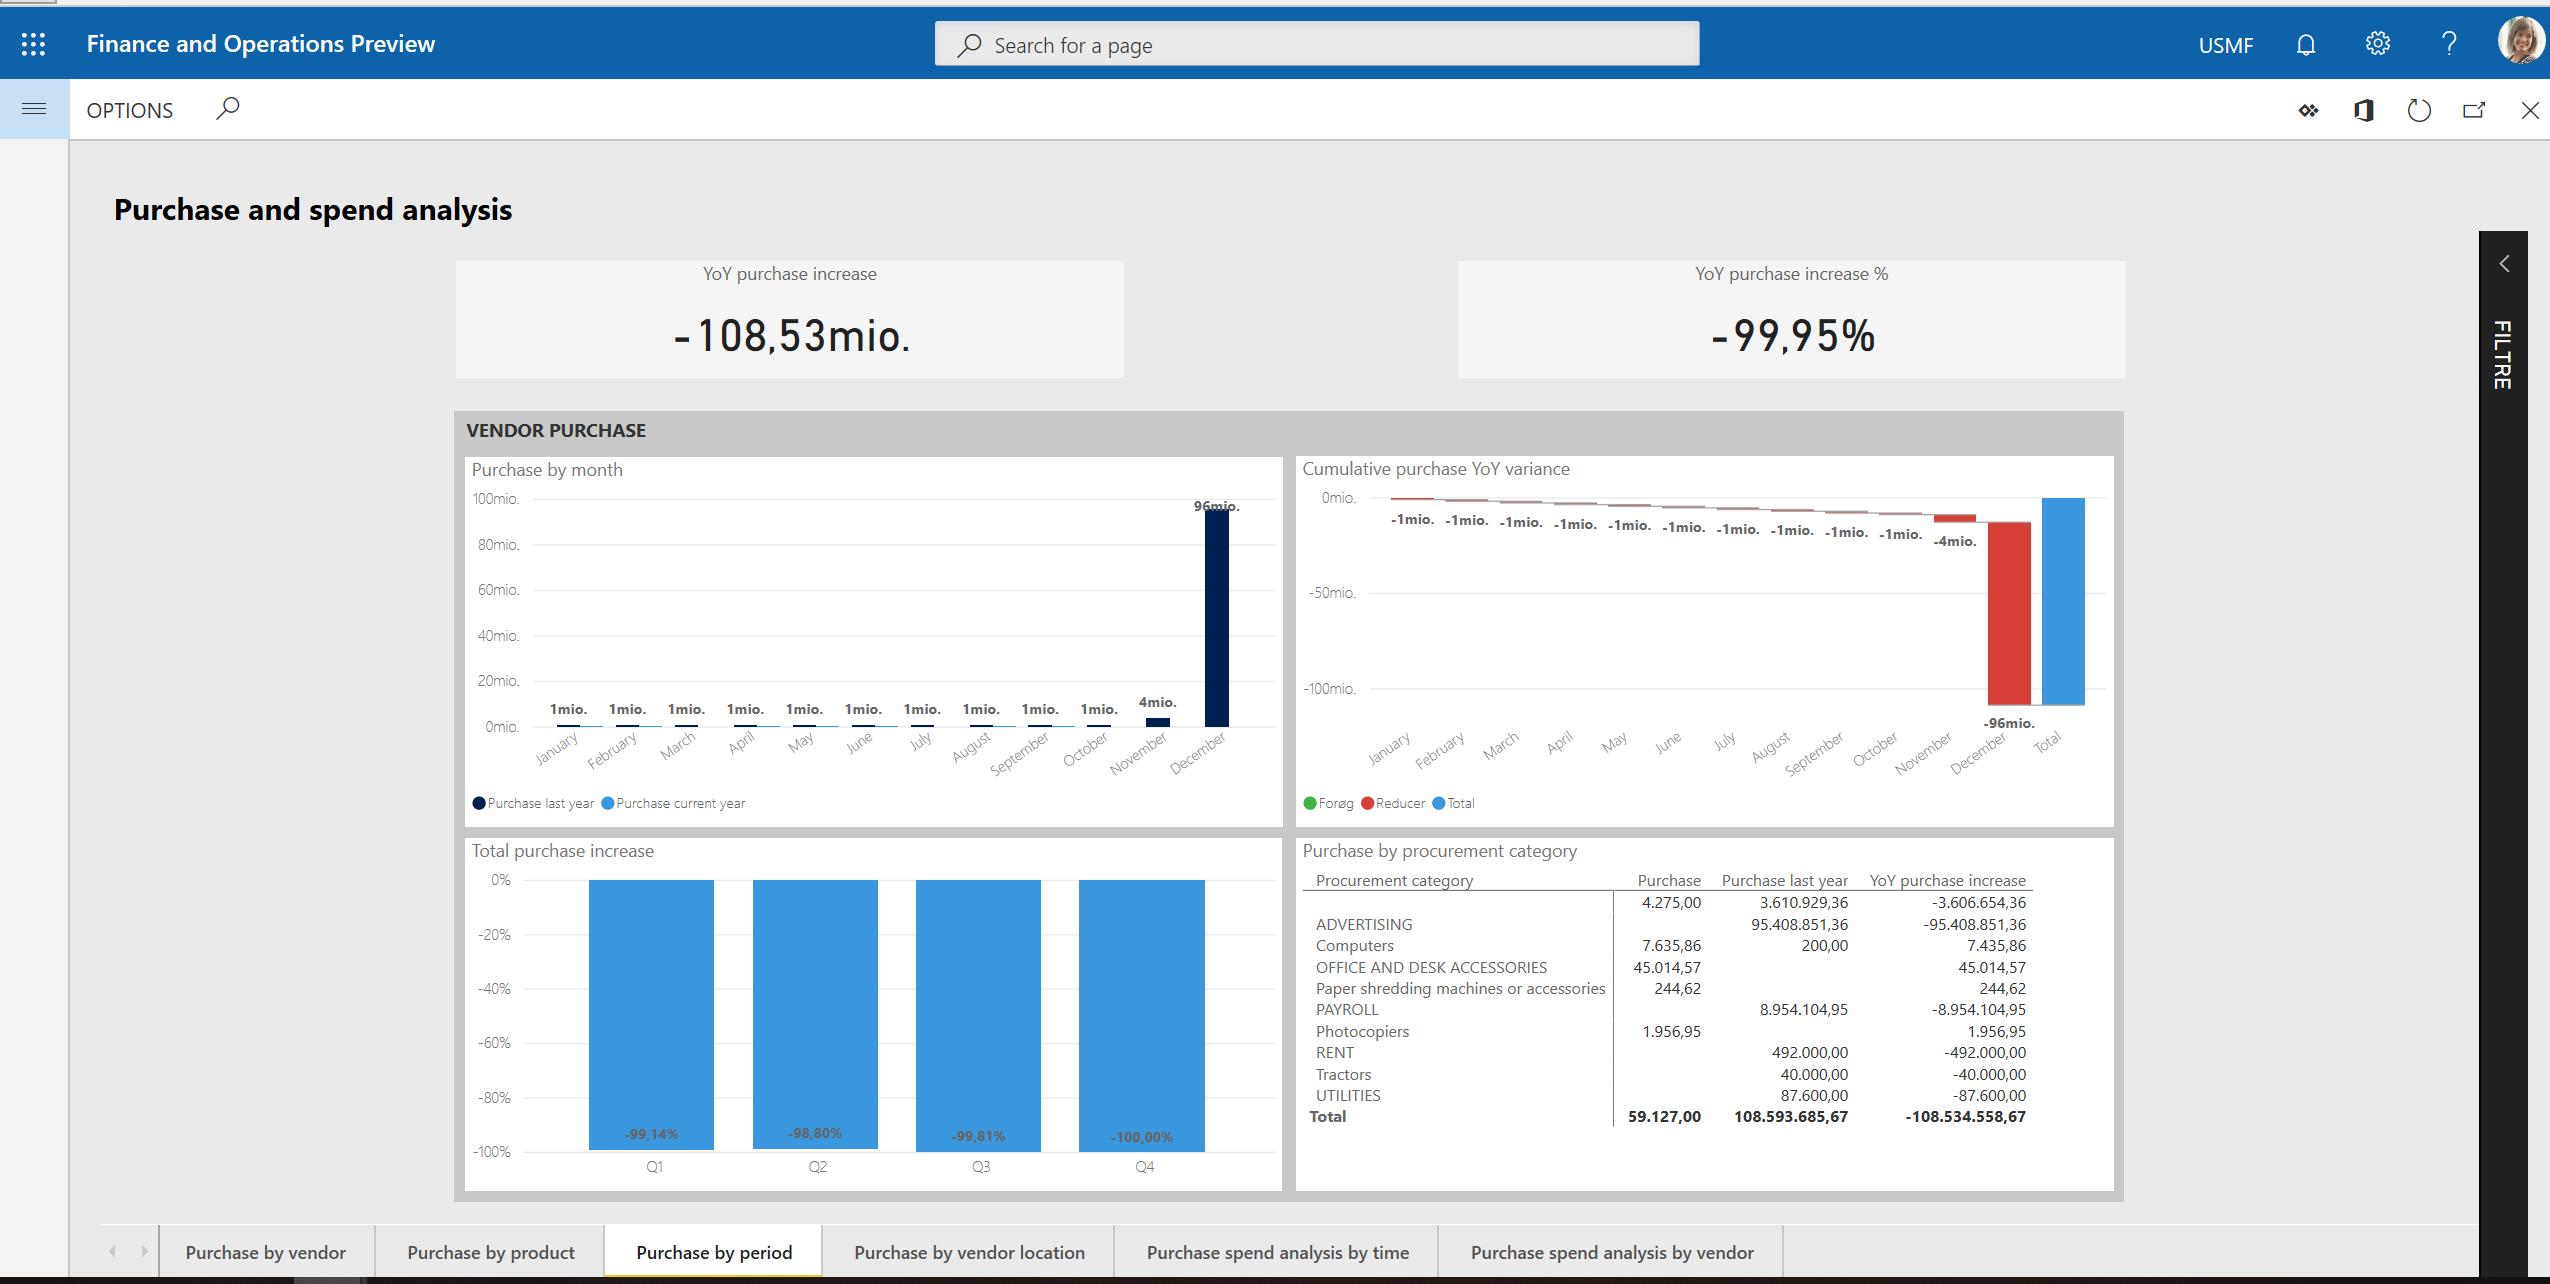 Purchase spend analysis Power BI content - Finance